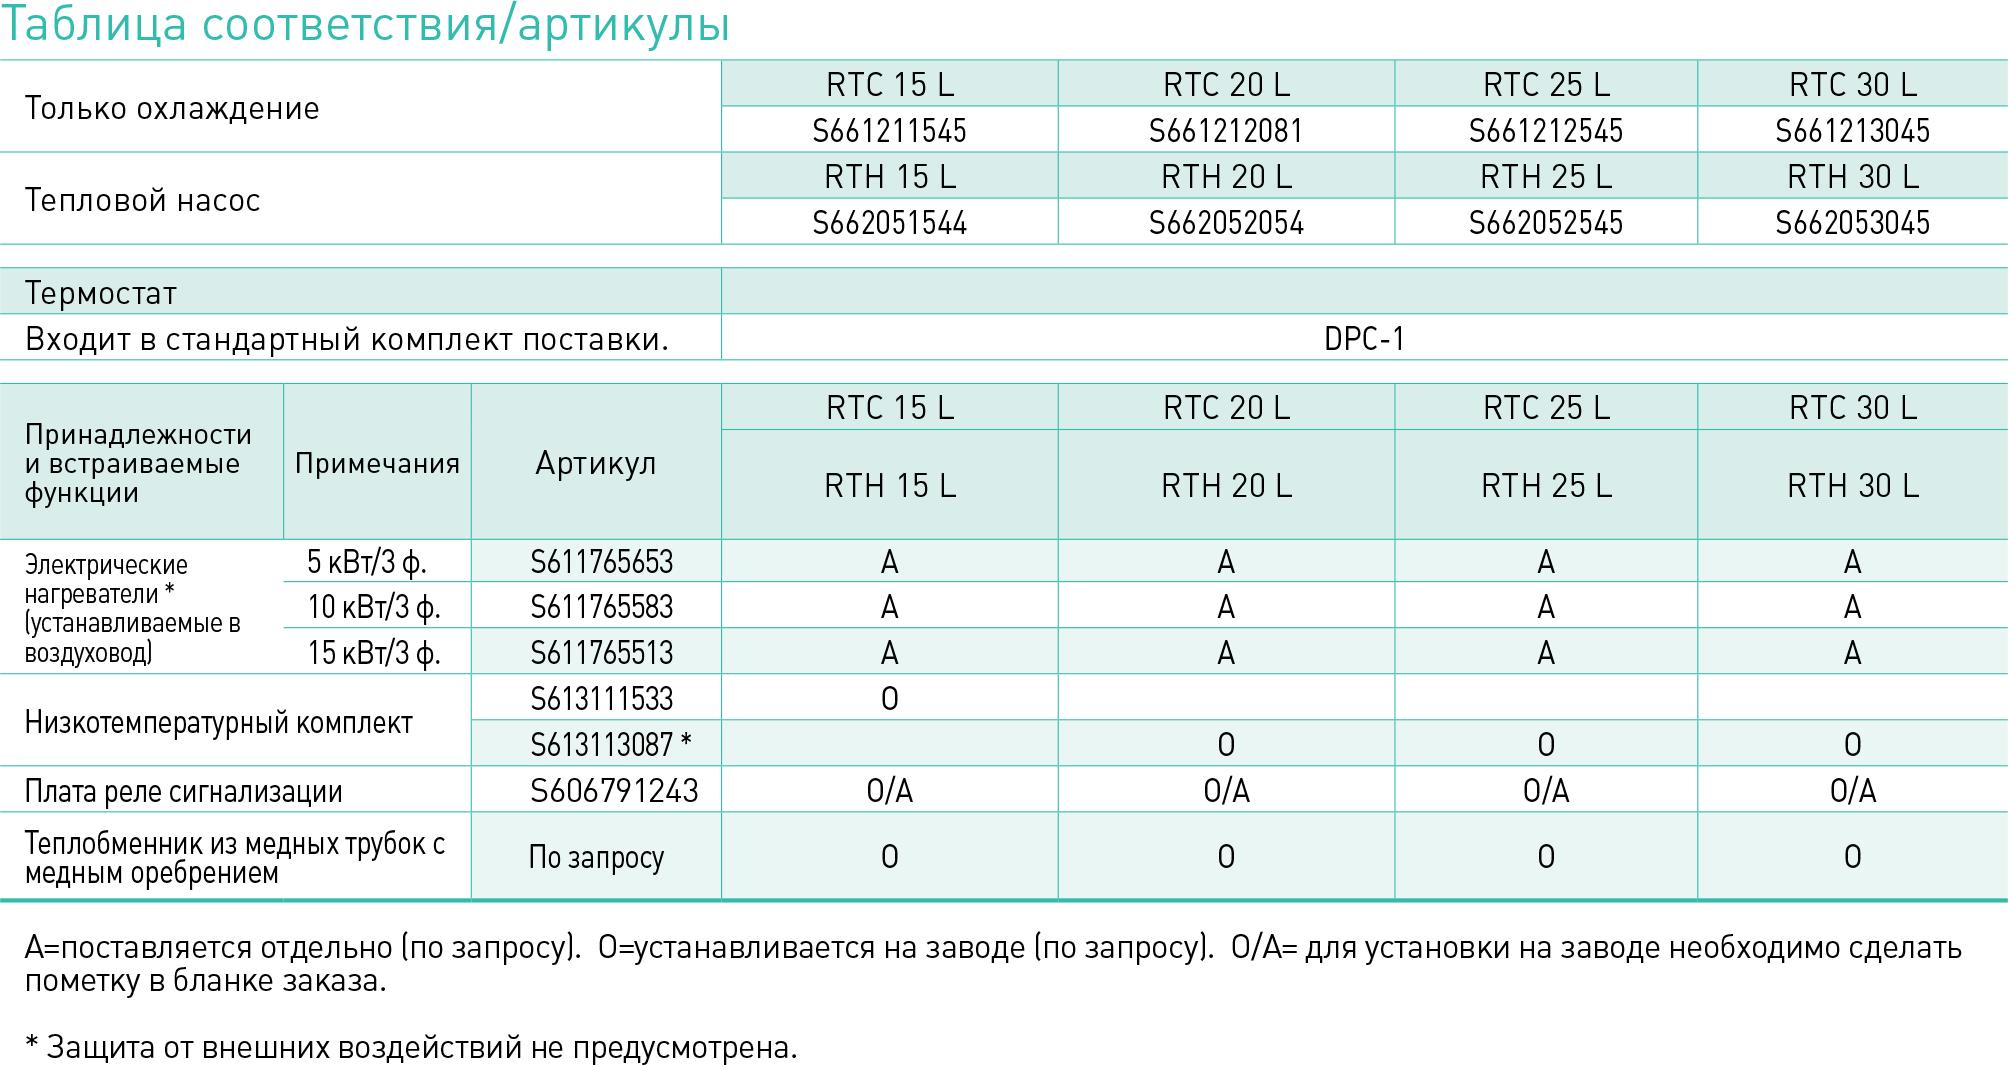 p101-table-correspondece